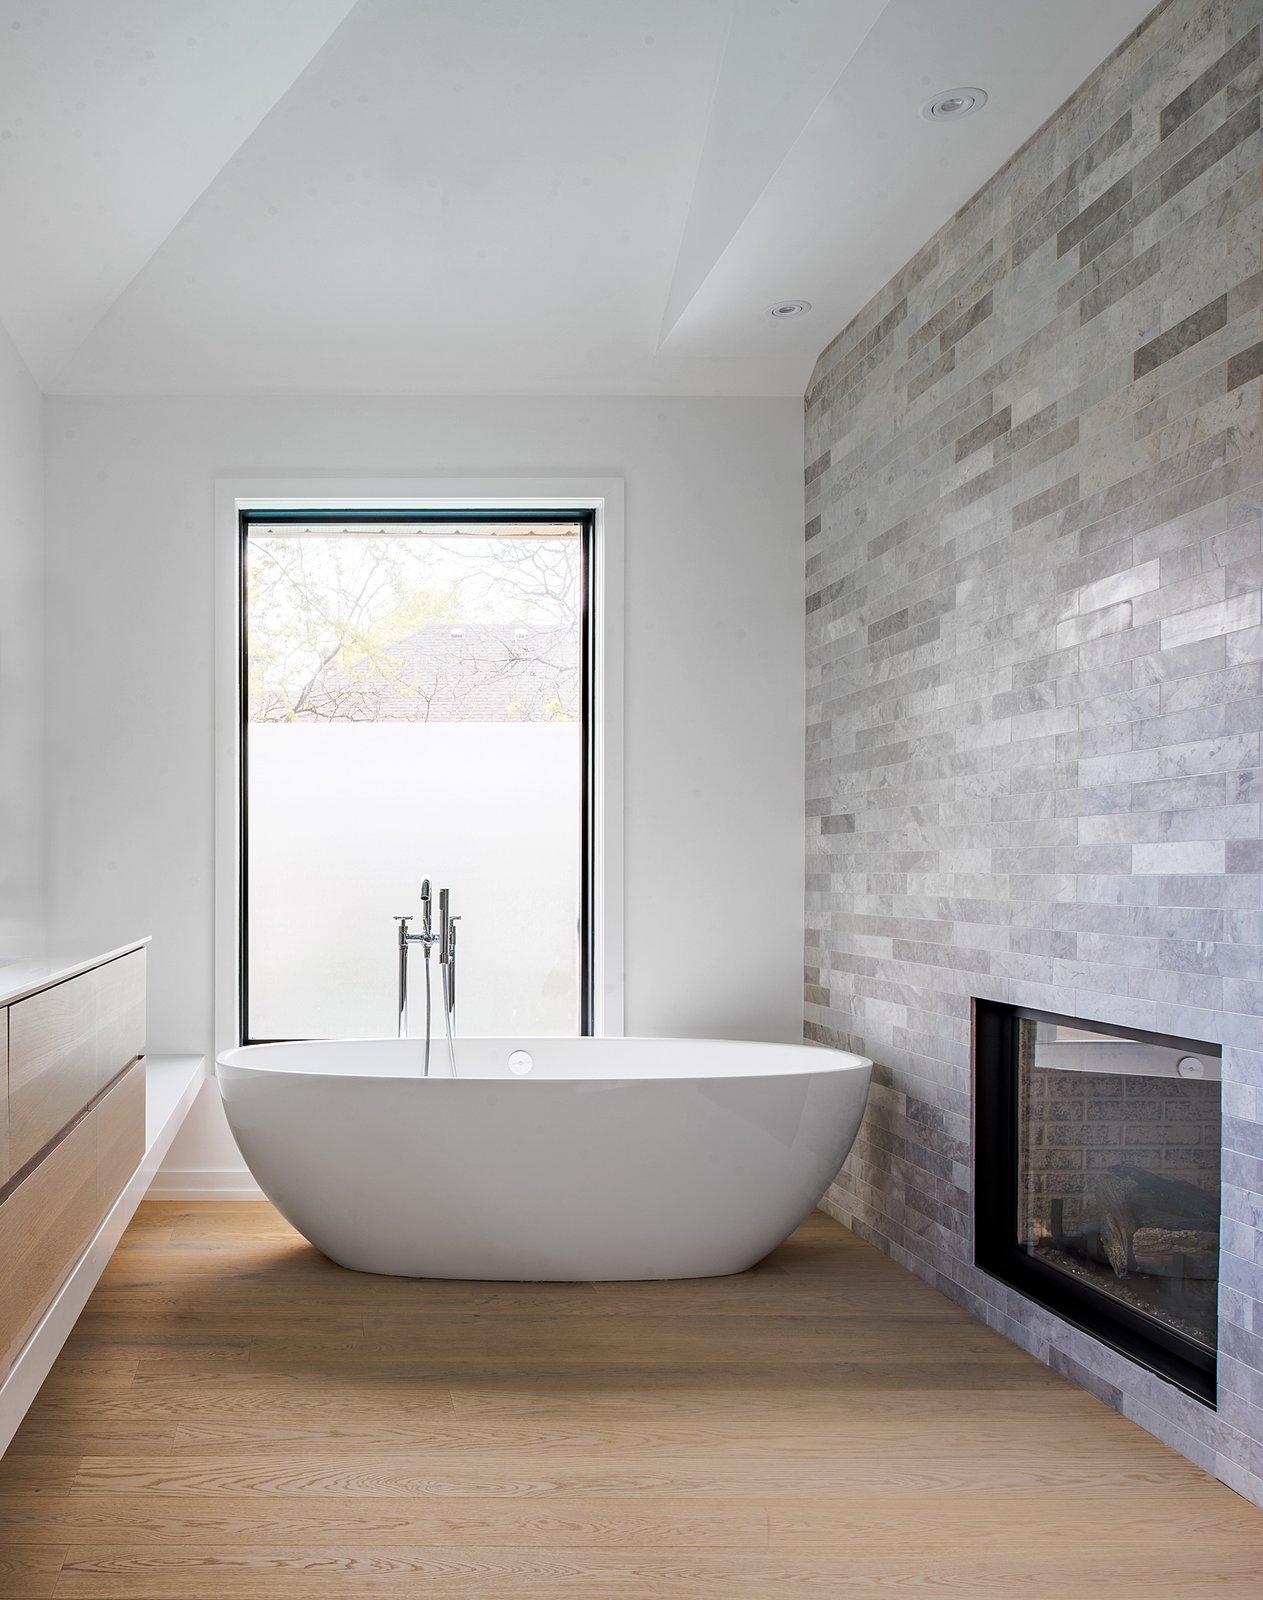 Bath Room, Engineered Quartz Counter, Undermount Sink, Light Hardwood Floor, Freestanding Tub, Ceiling Lighting, Open Shower, Stone Tile Wall, and Soaking Tub  Richview Residence